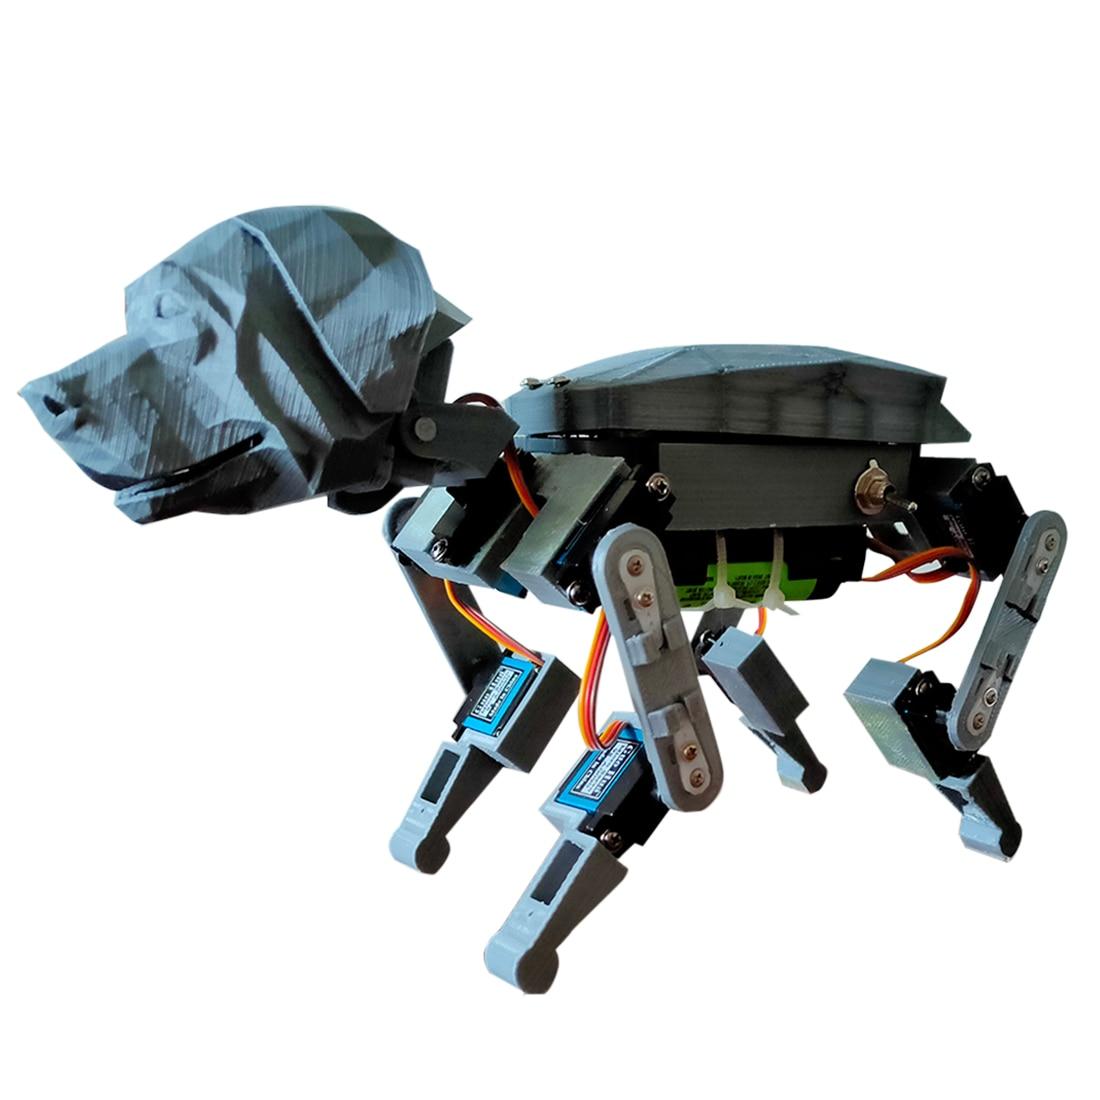 Programmable Mechanical Cat 11DOF Bionic Quadruped Crawling Robot Toy Brain-Training For Children Educational Toys Birthday Gift